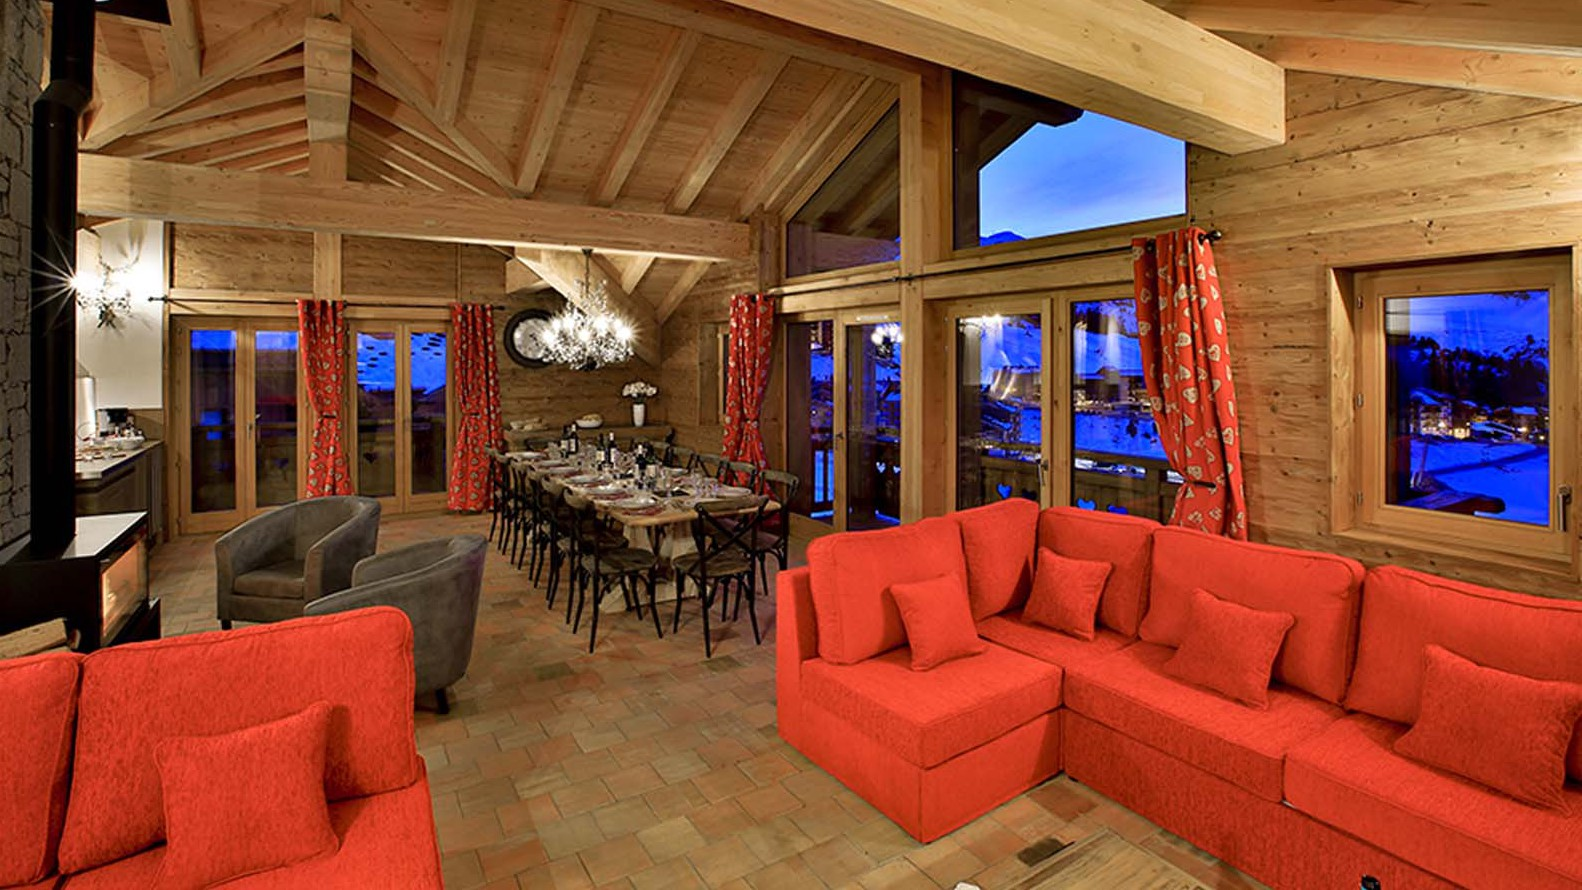 Lounge - Chalet Campanula - Ski Chalet in La Plagne, France